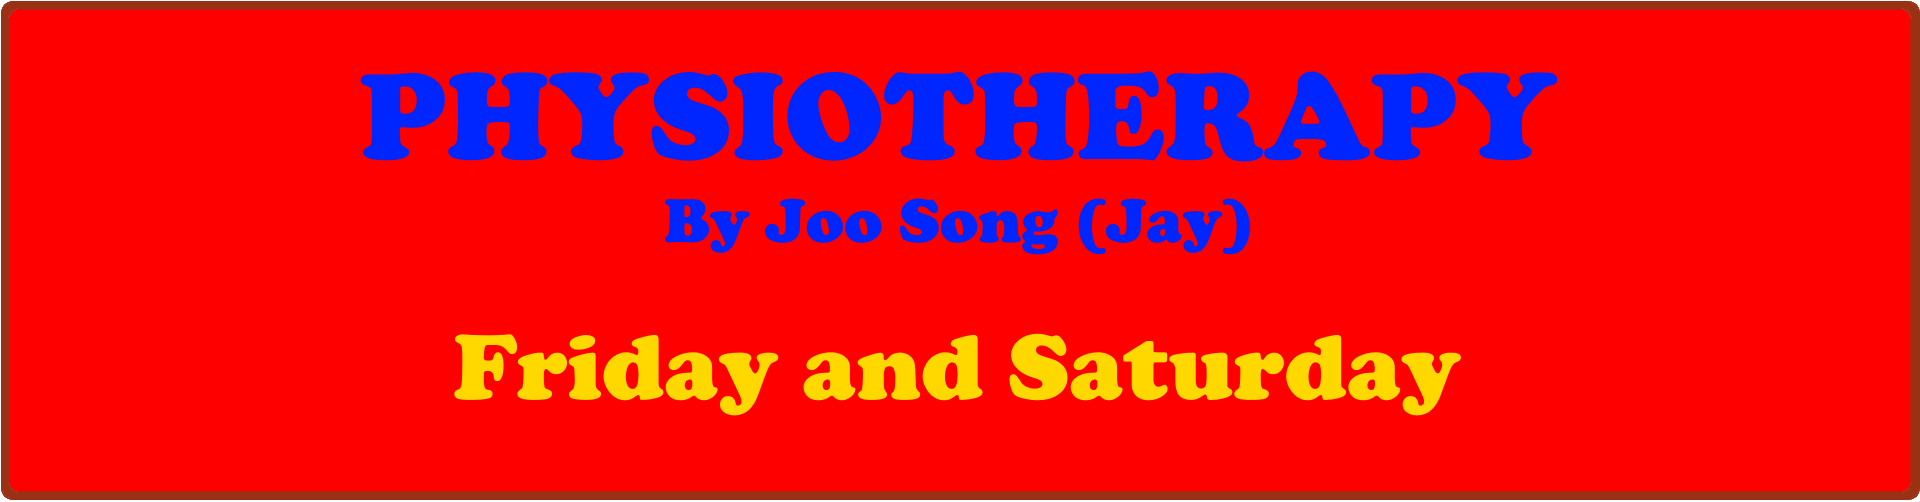 physio-joo-song